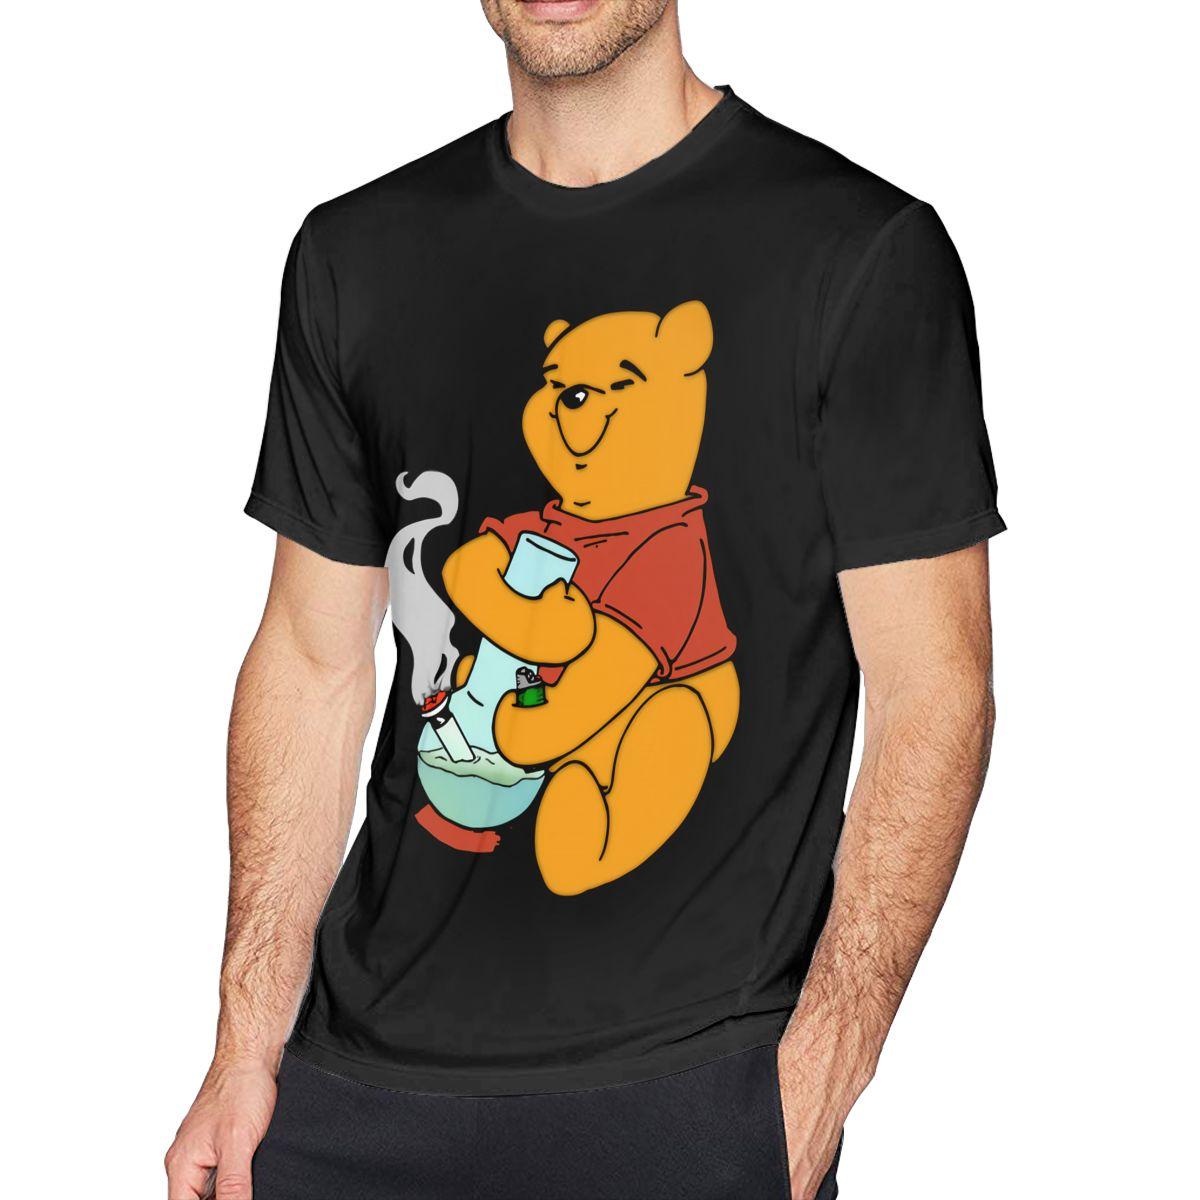 Camiseta Honey Pooh The Pot Head Camiseta Hombre 4xl camiseta 100 algodón lindo estampado camiseta manga corta